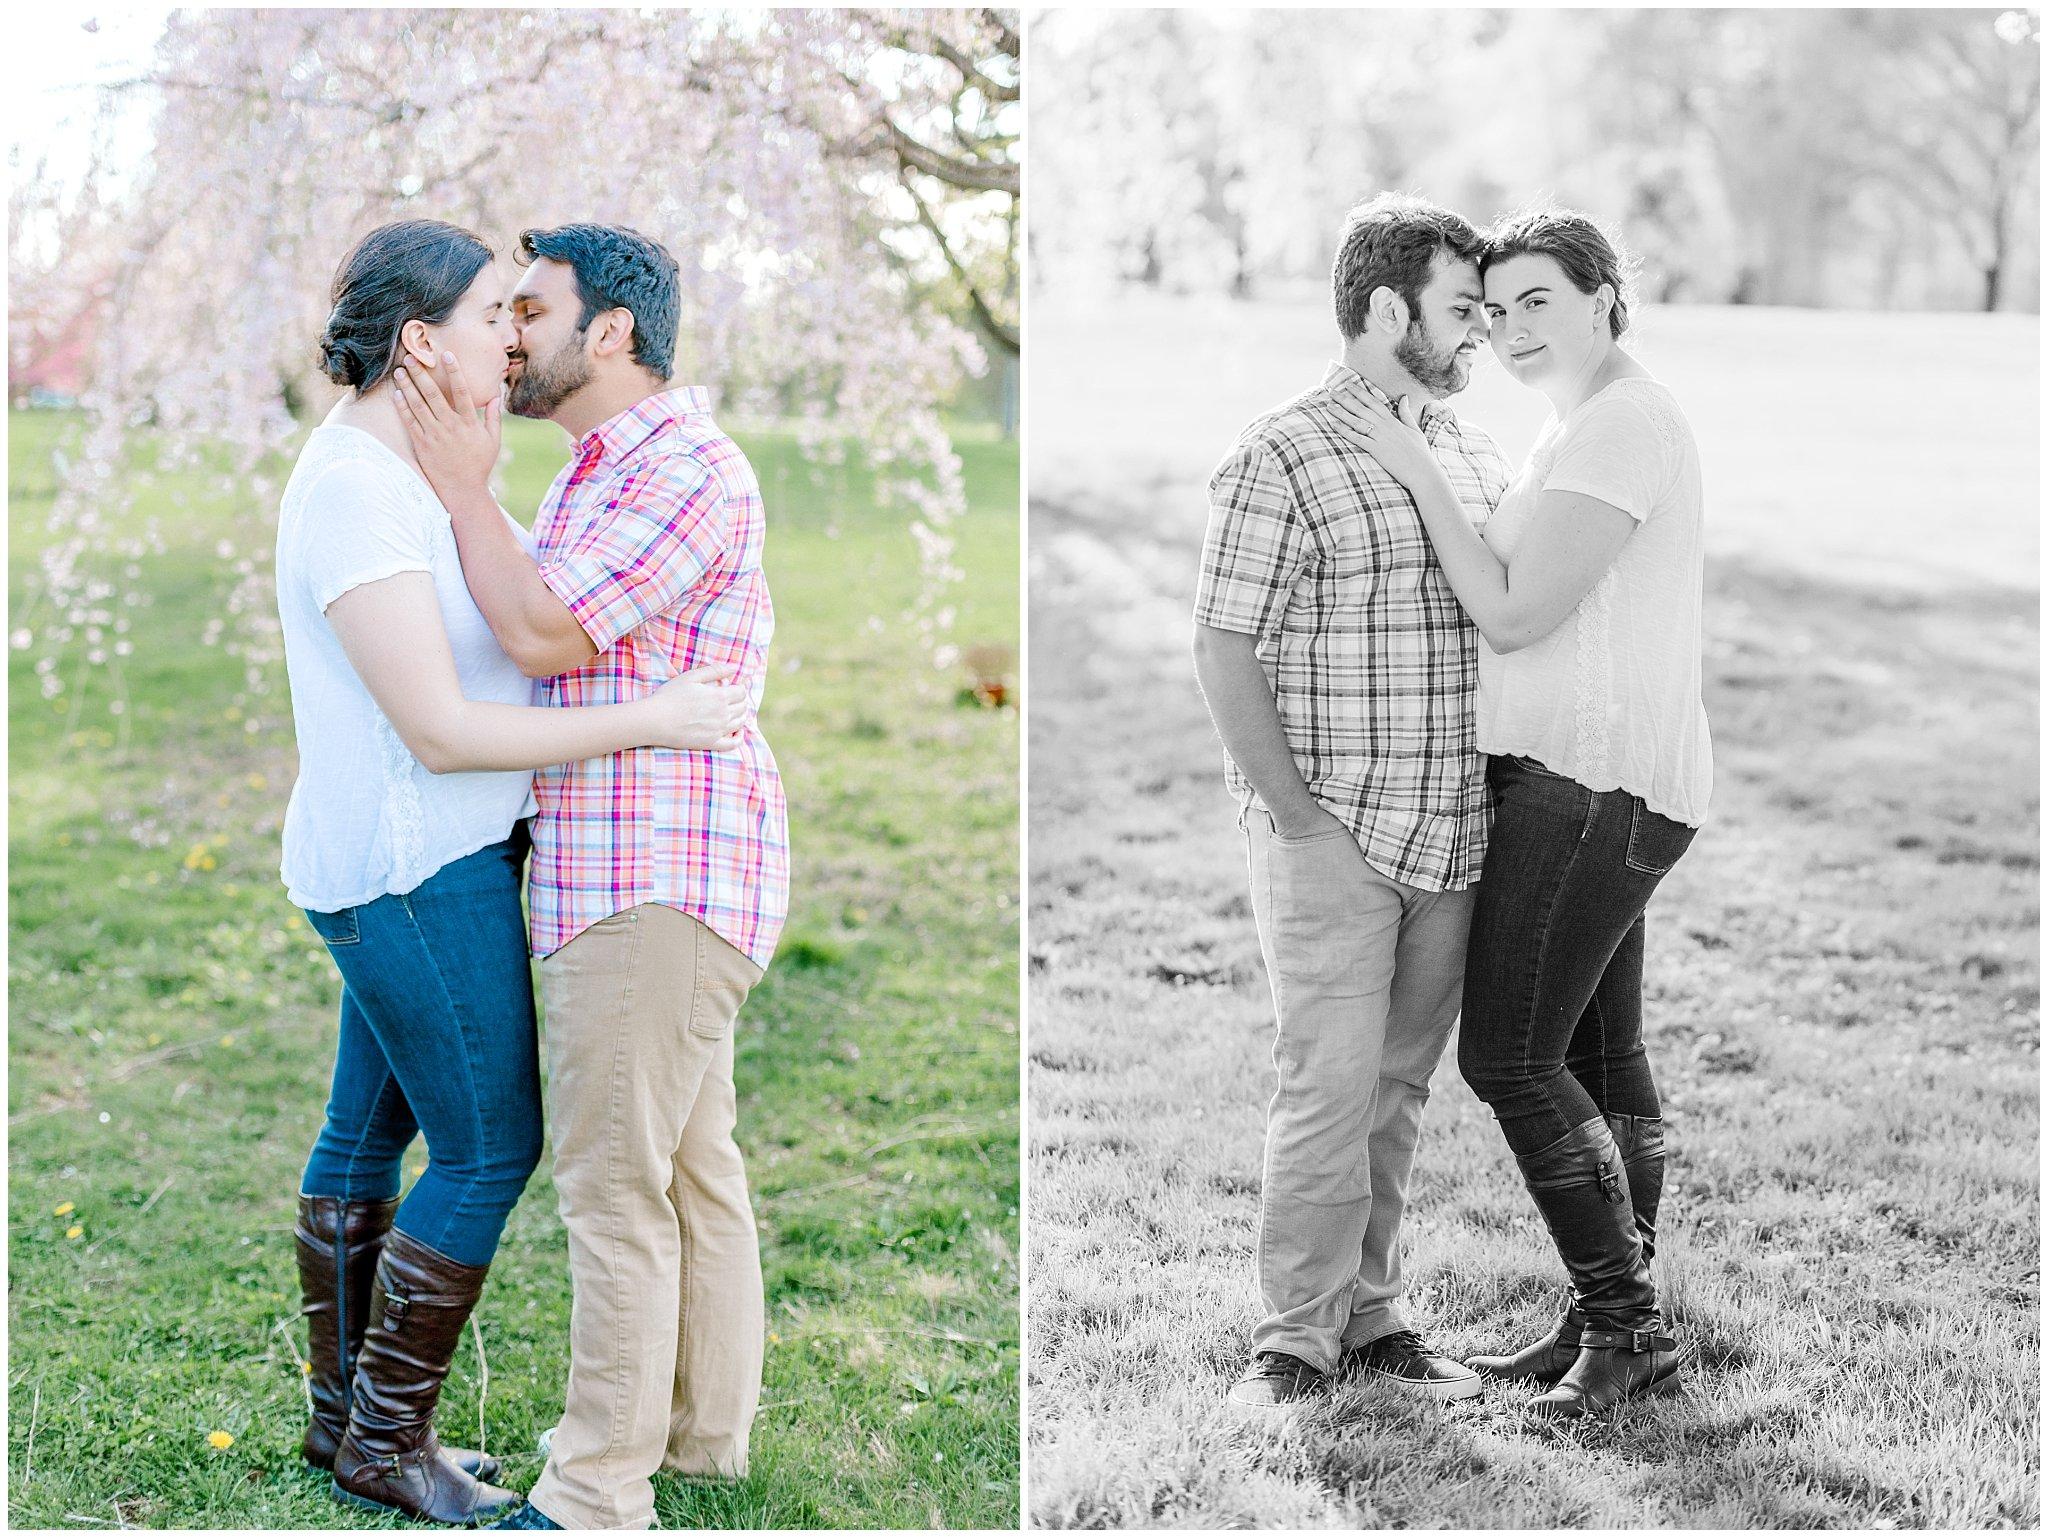 Lehigh Valley Spring Cherry Blossom Engagement Session Pennsylvania Wedding Photographer (20).jpg